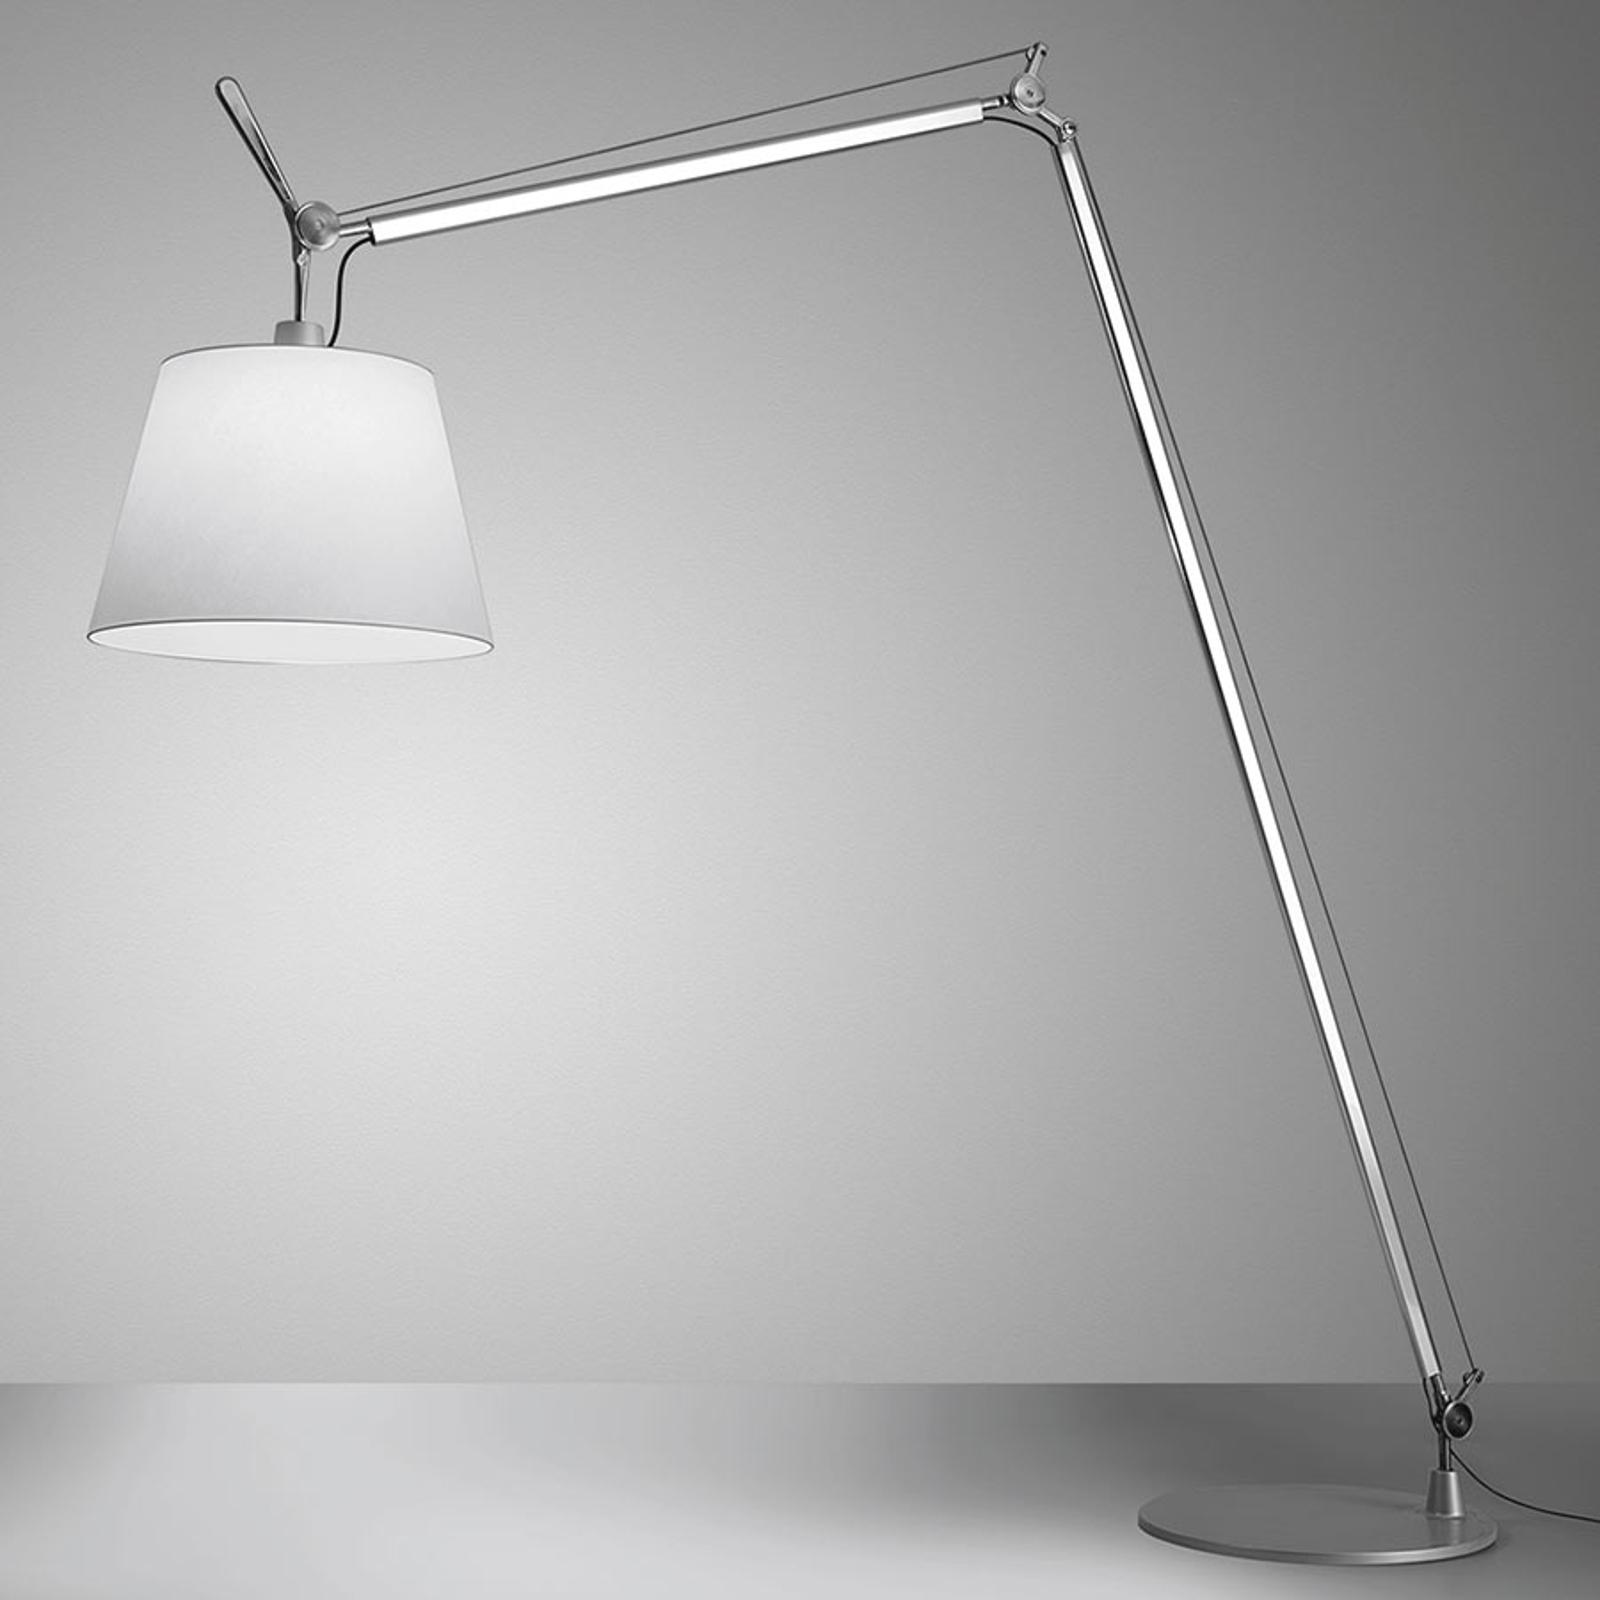 Artemide Tolomeo Maxi LED-Stehleuchte